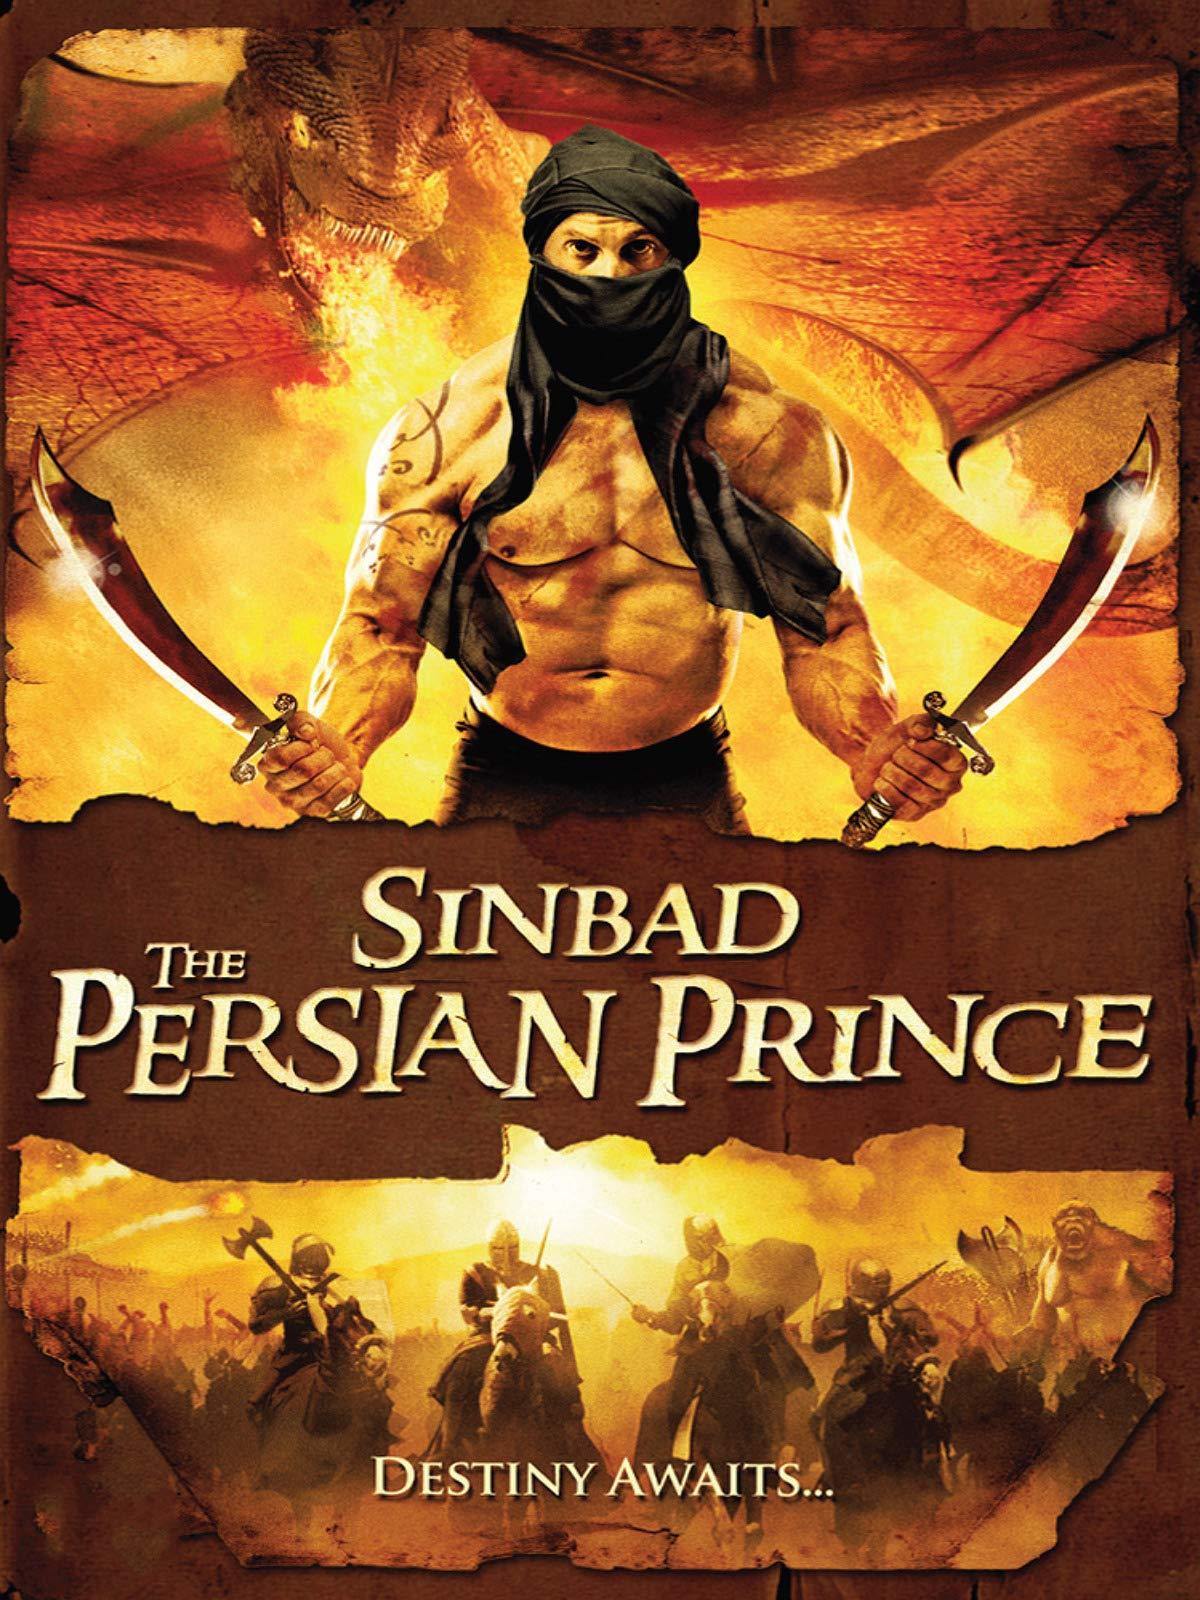 Sinbad: The Persian Prince